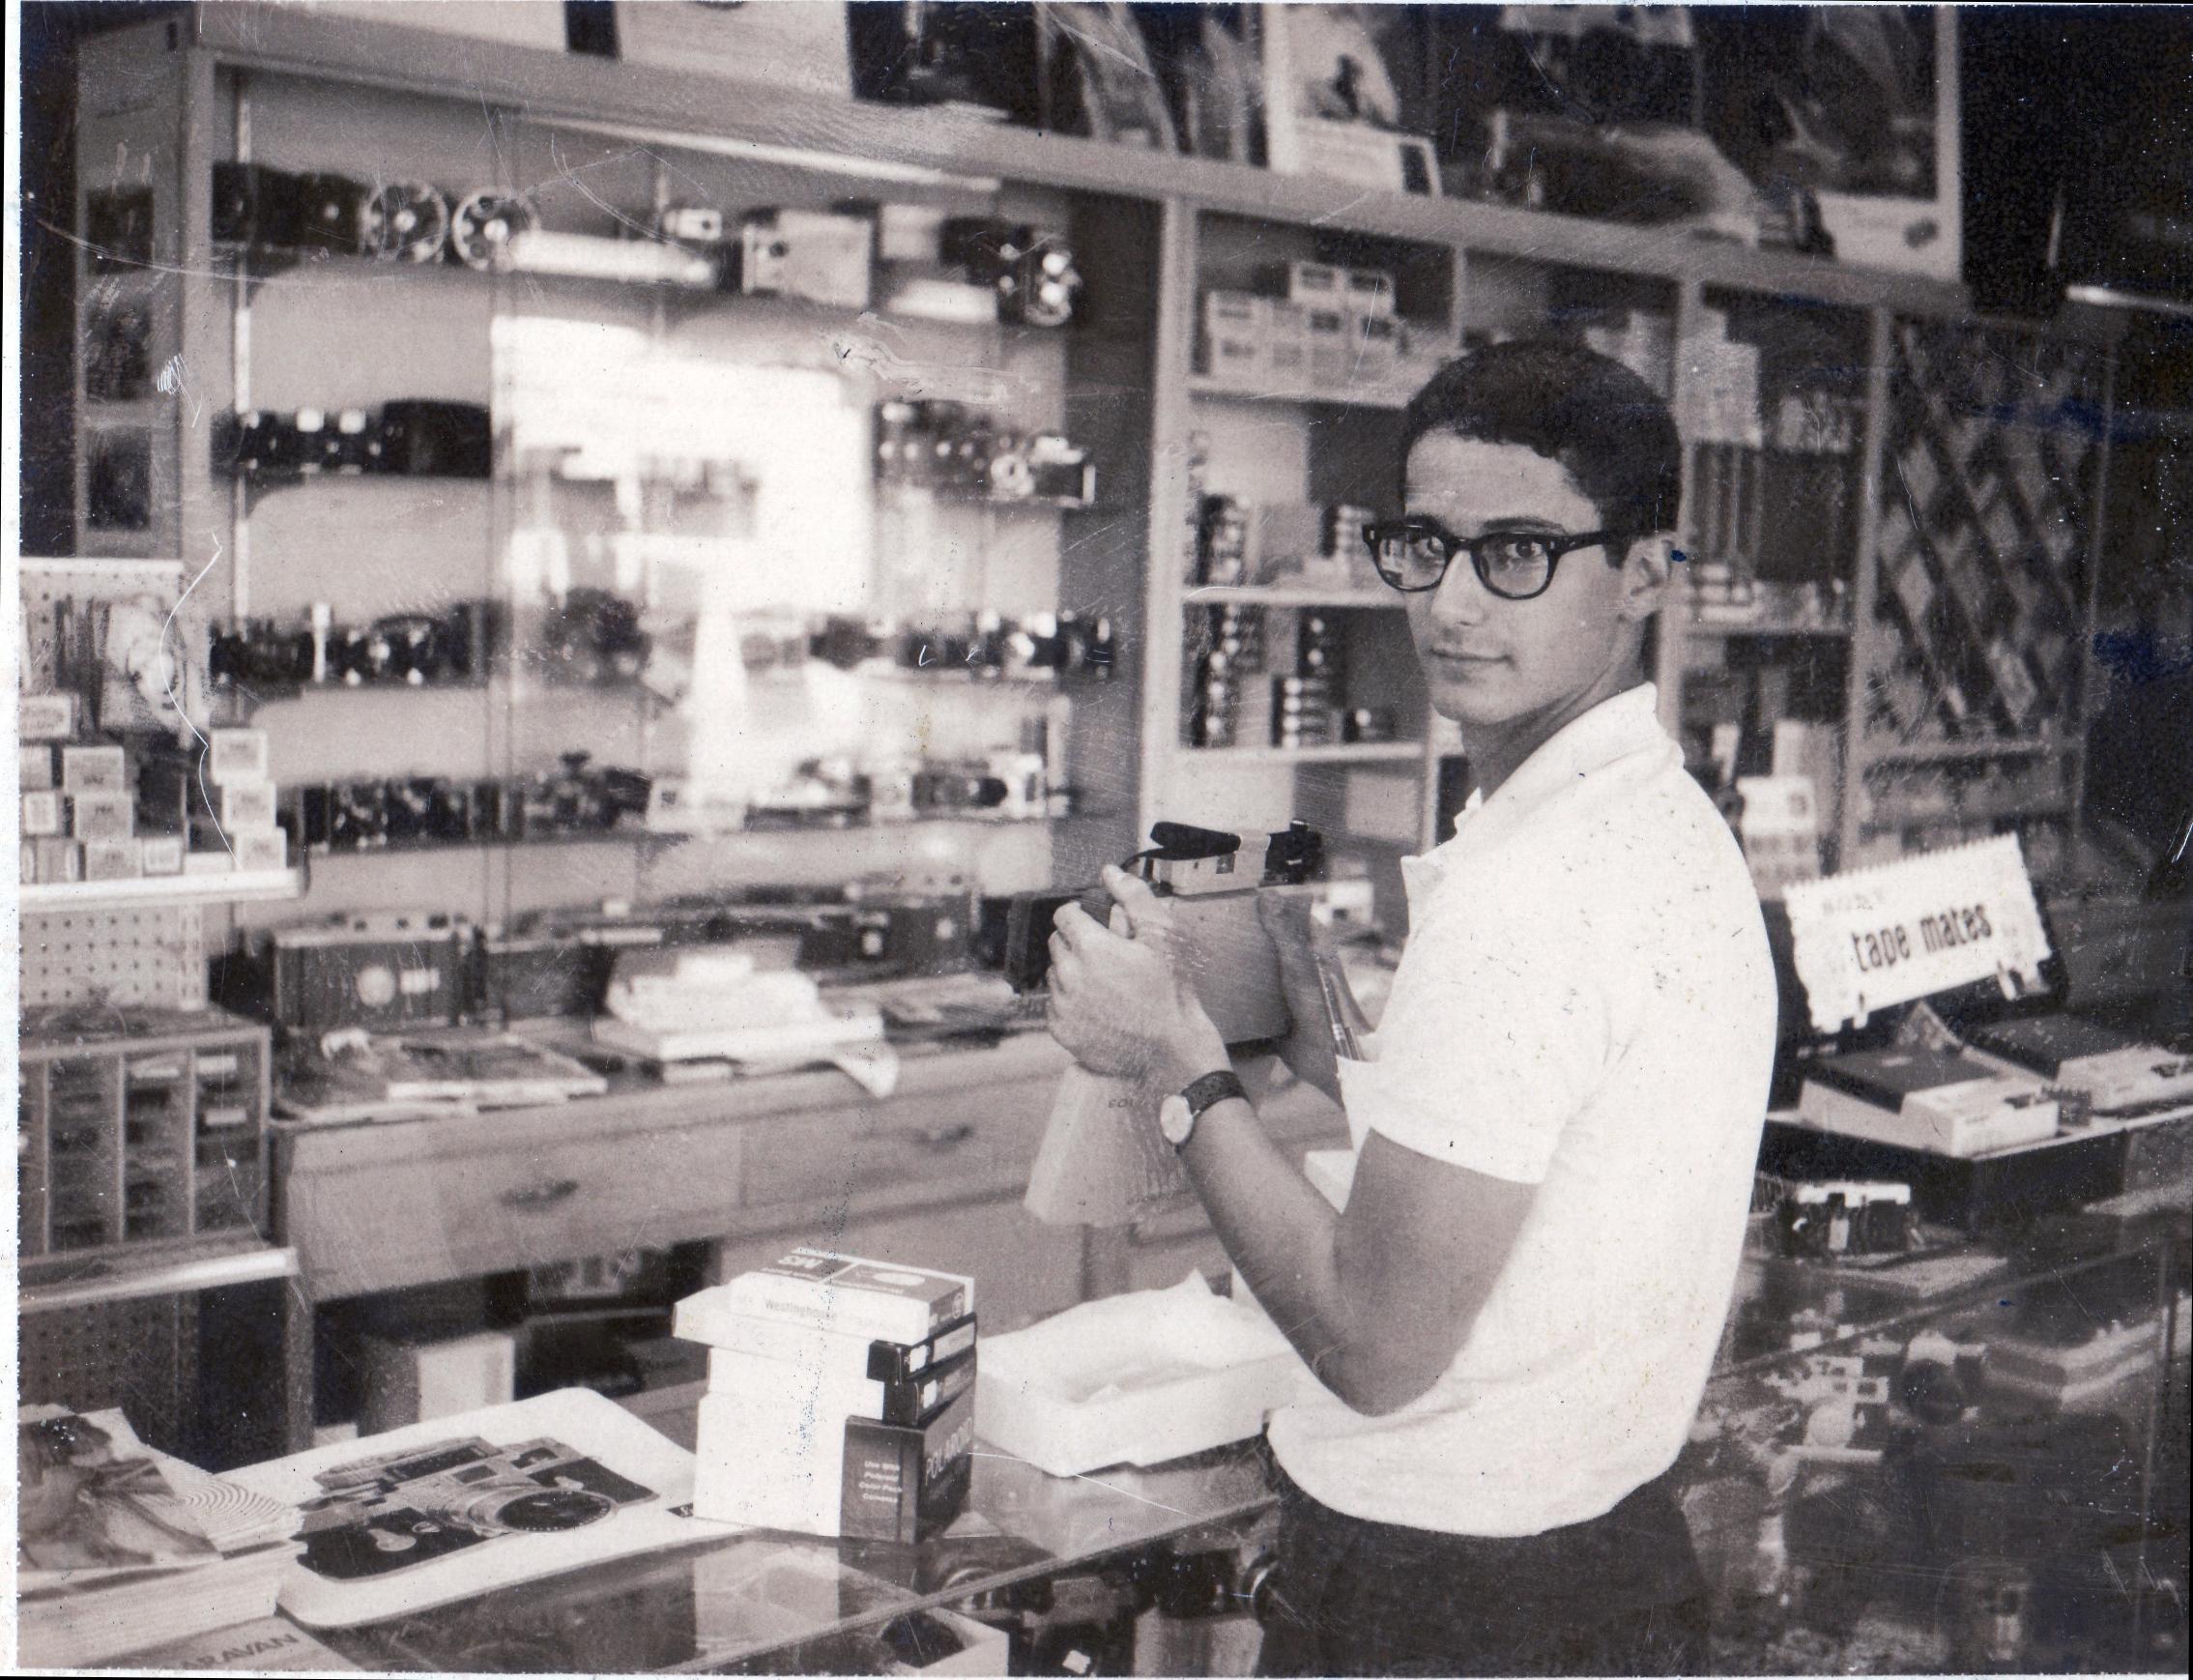 David Burnett at Shutterbug Camera shop: Salt Lake City circa 1965. © 2015 David Burnett/Contact Press Images